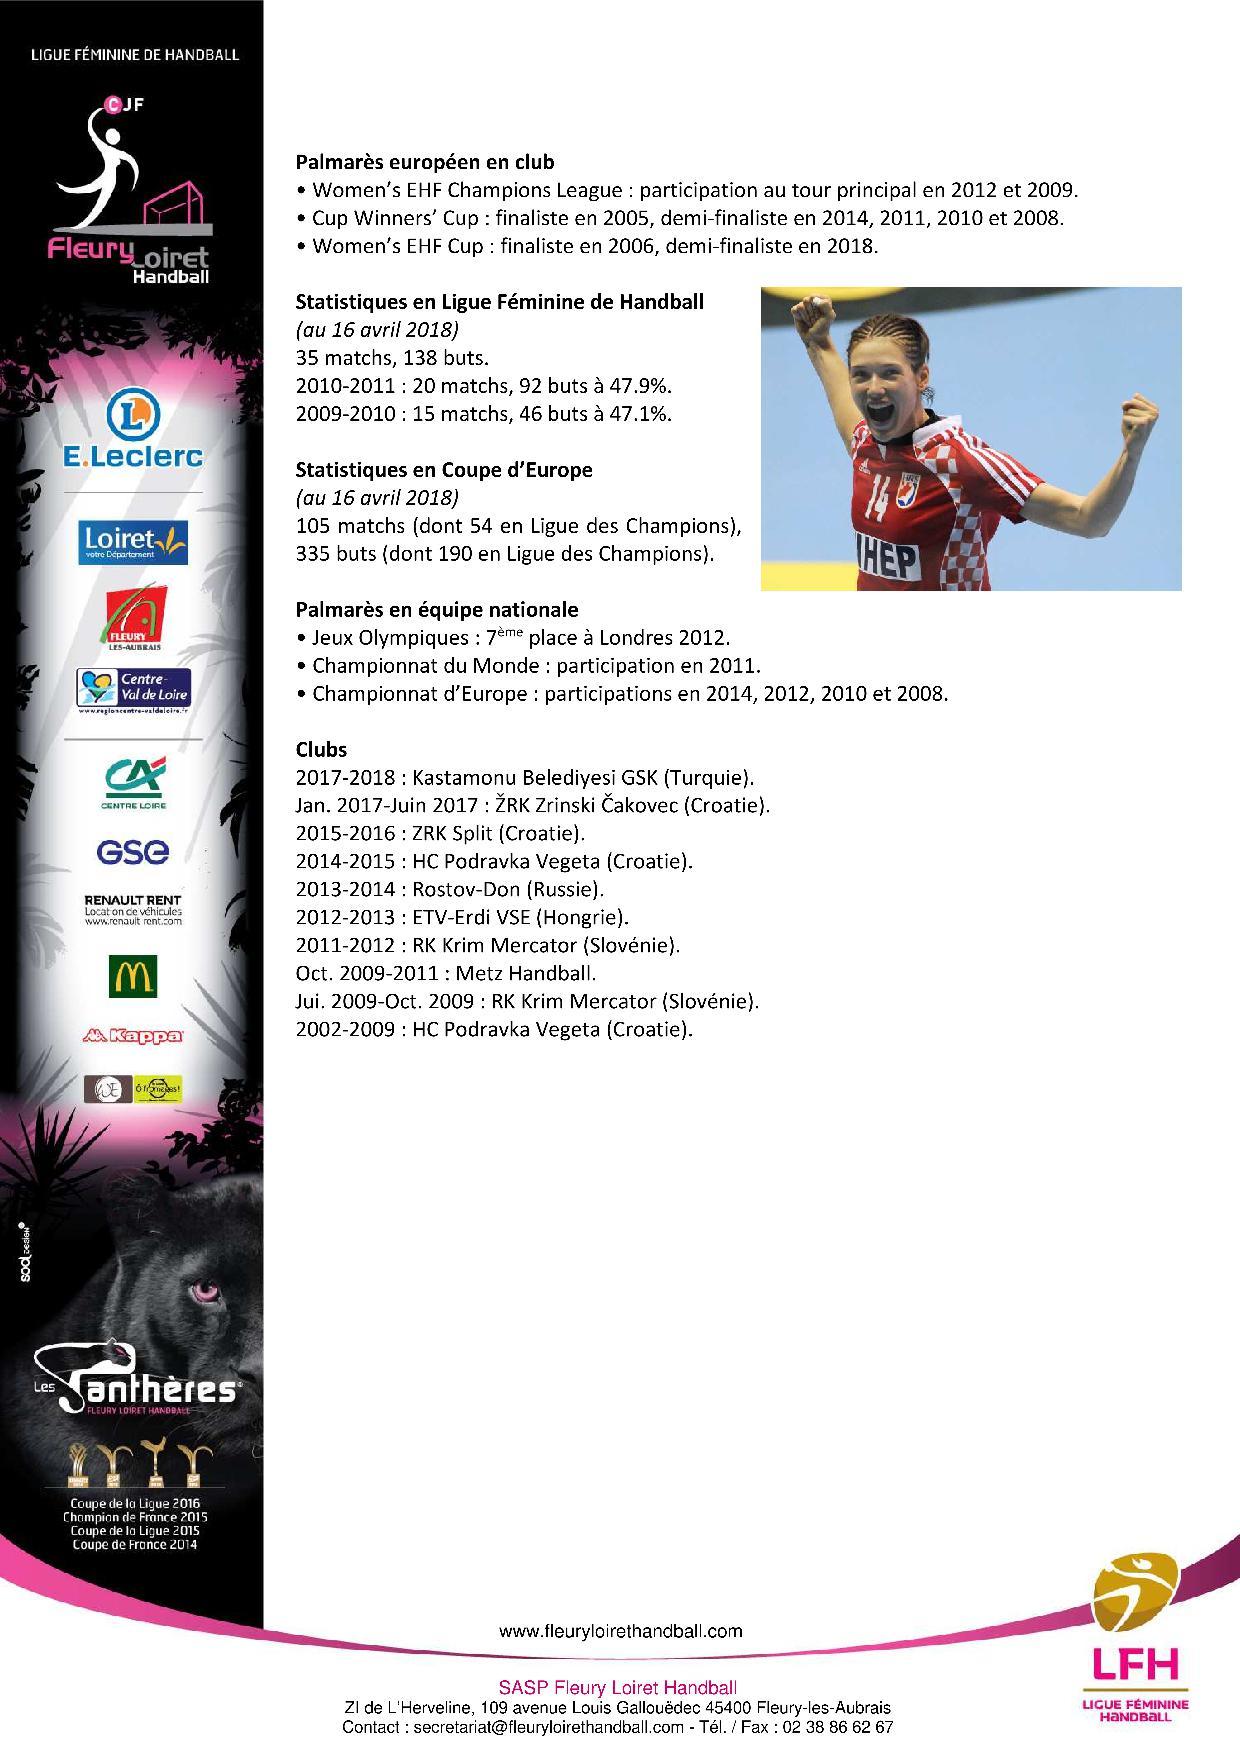 C_Users_Jose_AppData_Local_Temp_Communiqué Fleury Loiret Handball - Lundi 16 avril 20182.jpg